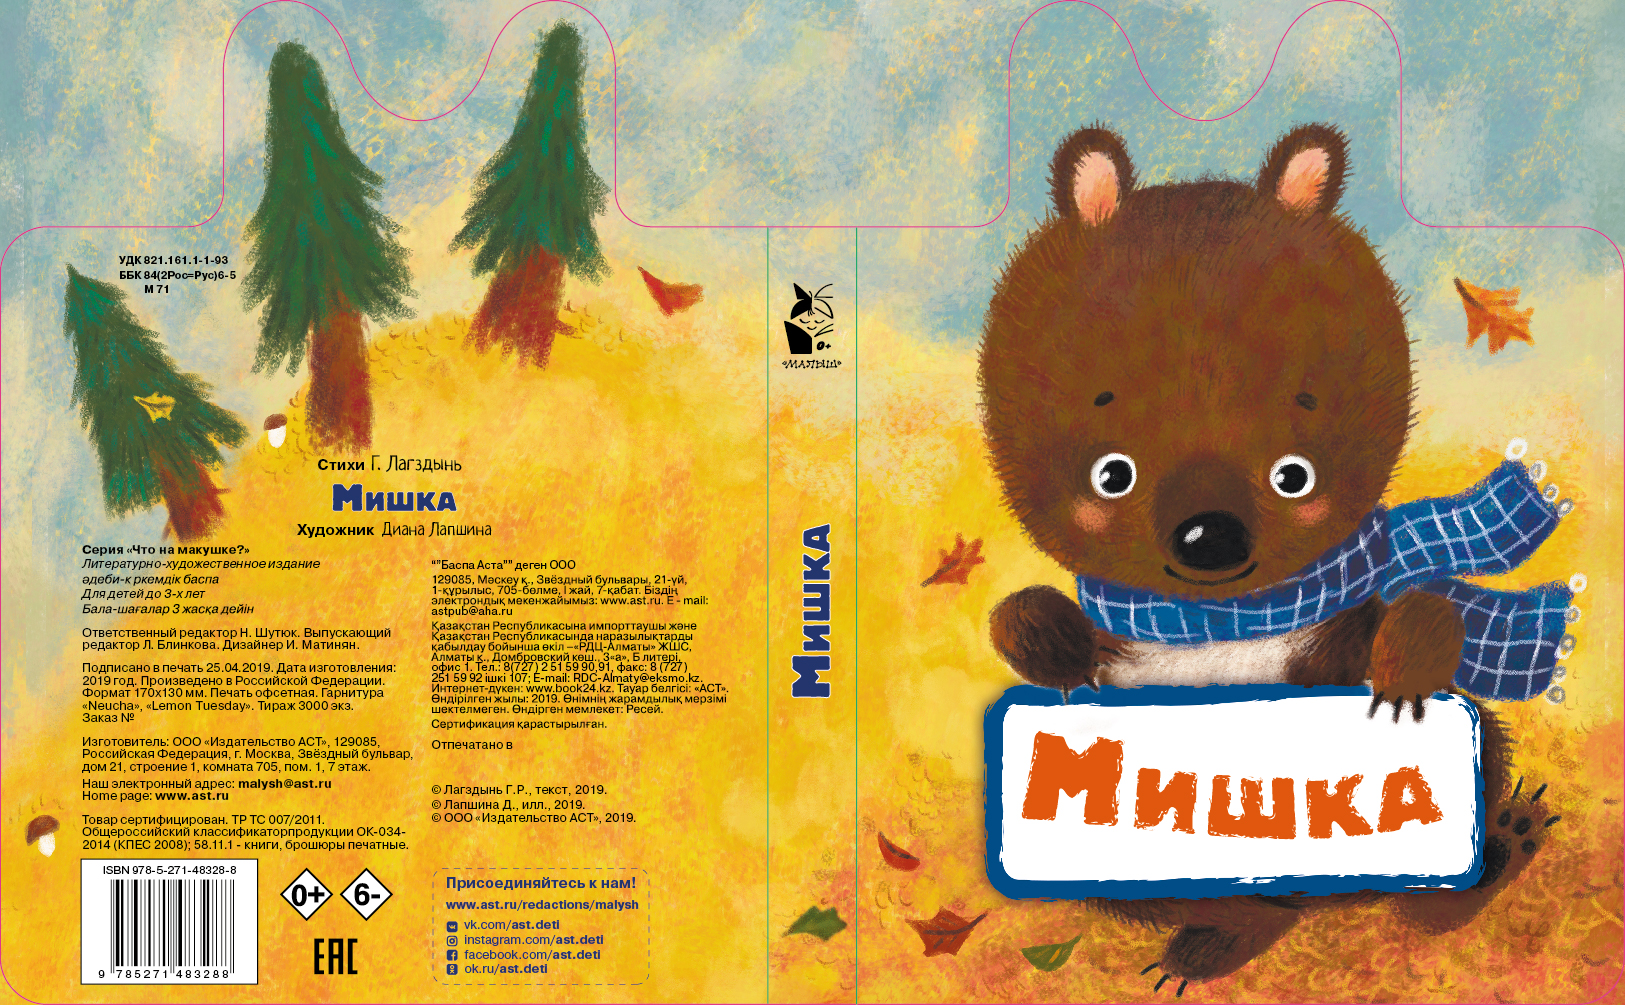 Mishka Cover new-01-01